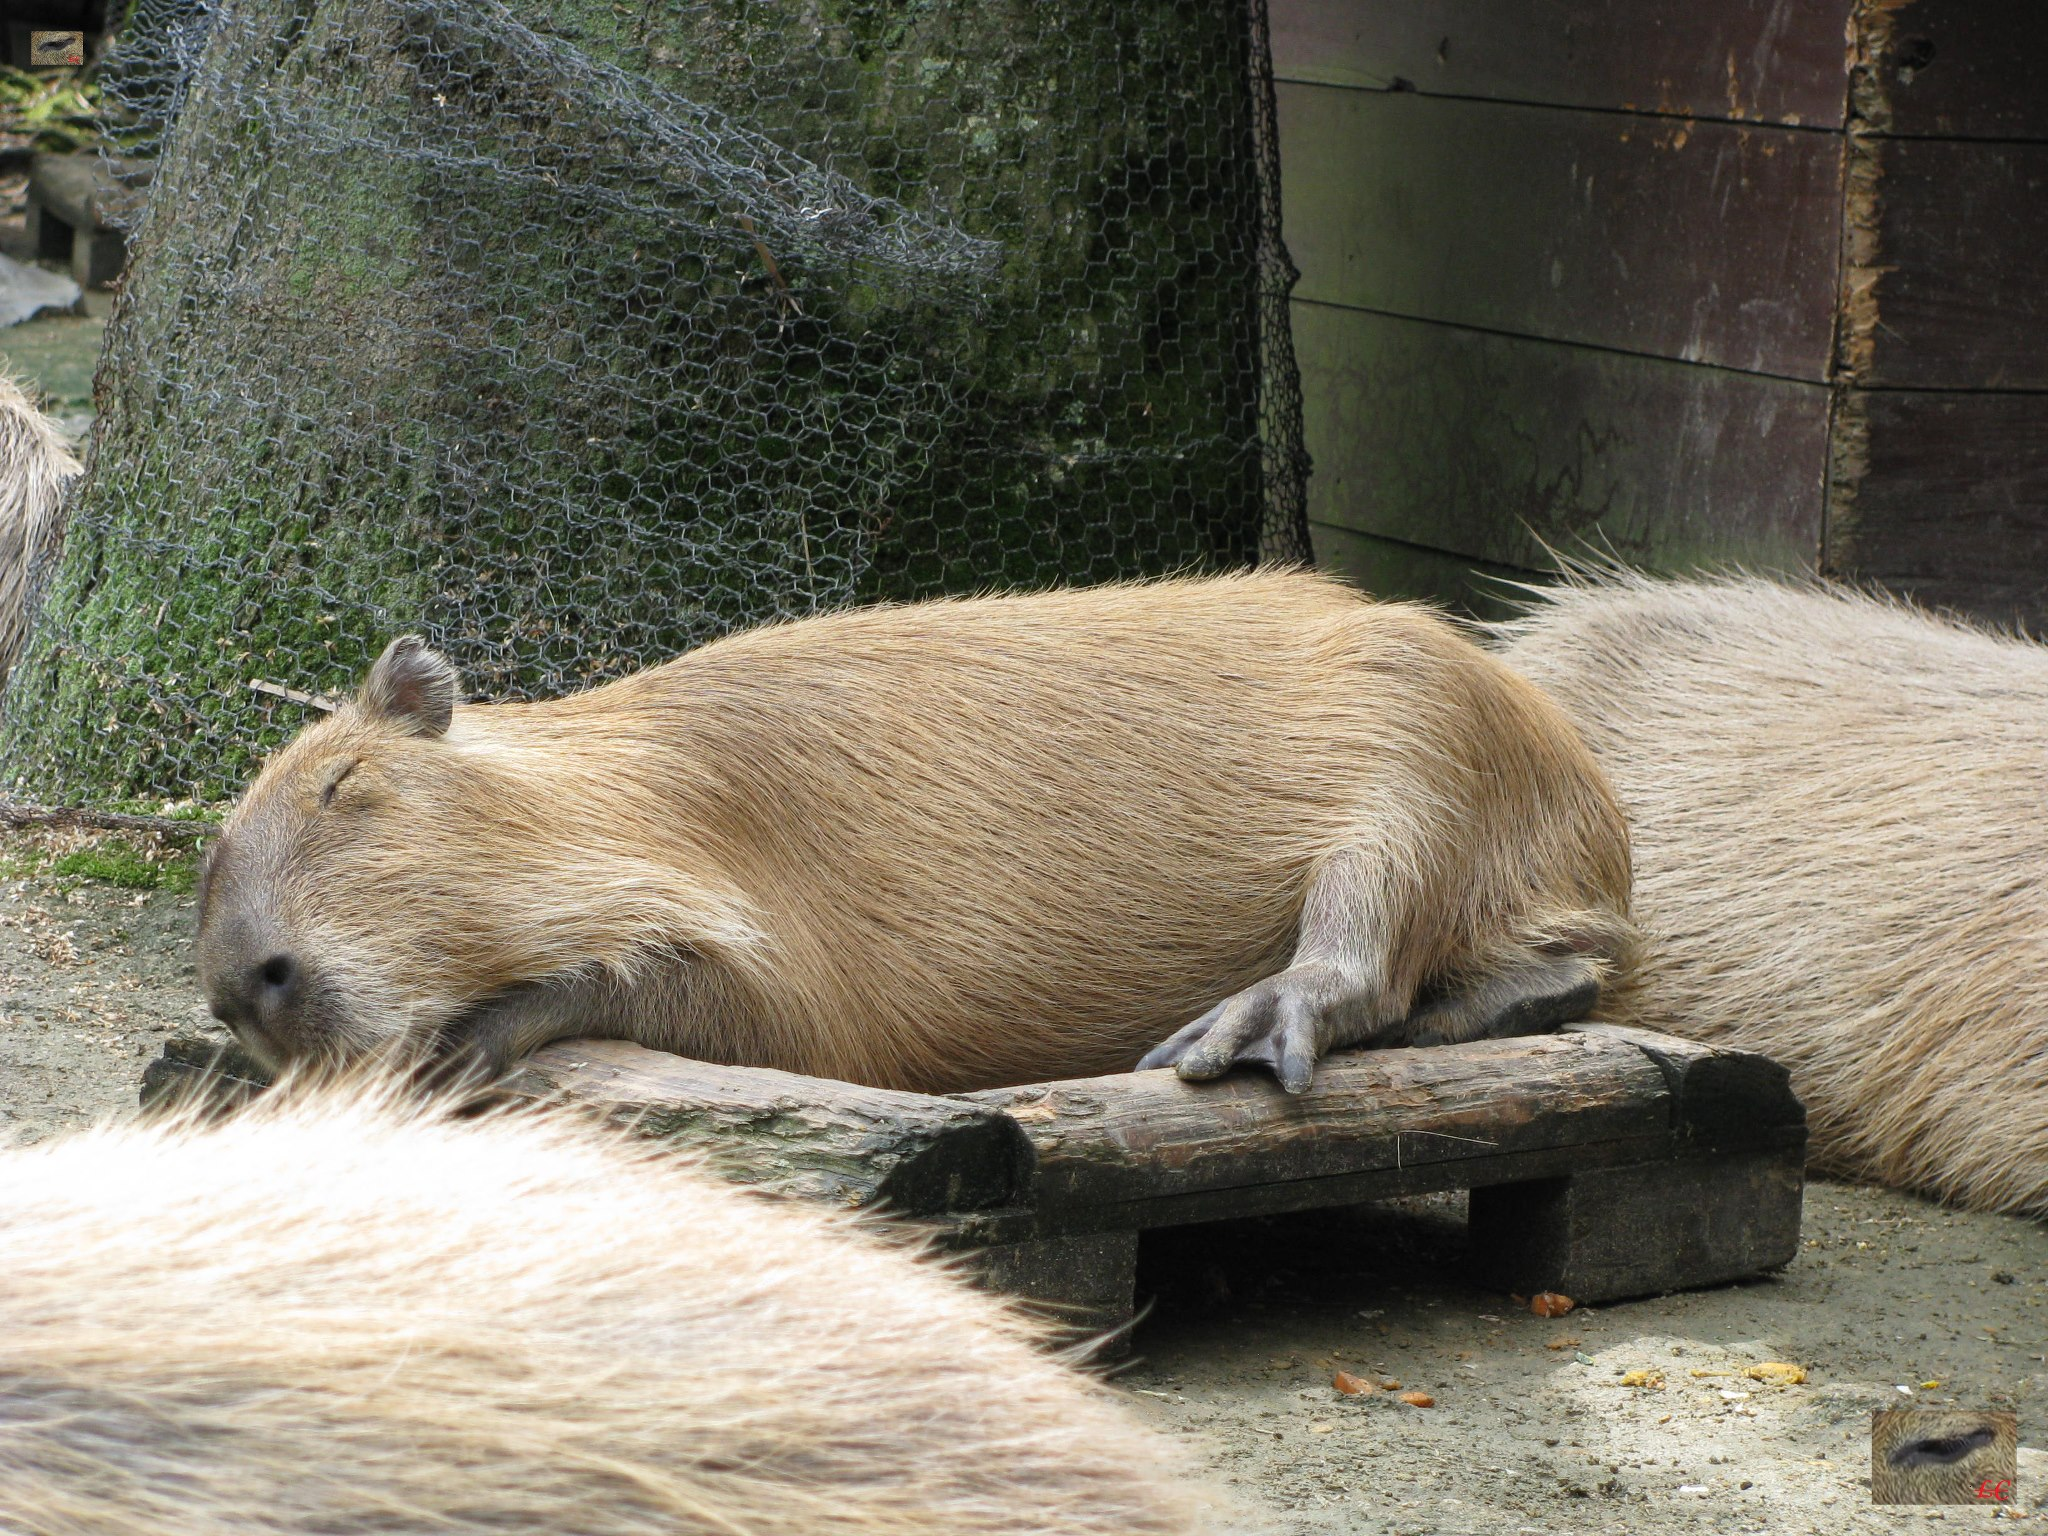 A few minutes later Yusu rolled over and fell off the feeding tray she was sleeping on. I love the way Capybaras like to sit on or sleep in their food trays 数分後Yusuがロールオーバー。 Yusuは、食品トレイから落ちた。 かわいいので - カピバラは、その食品トレーで寝るのが好き